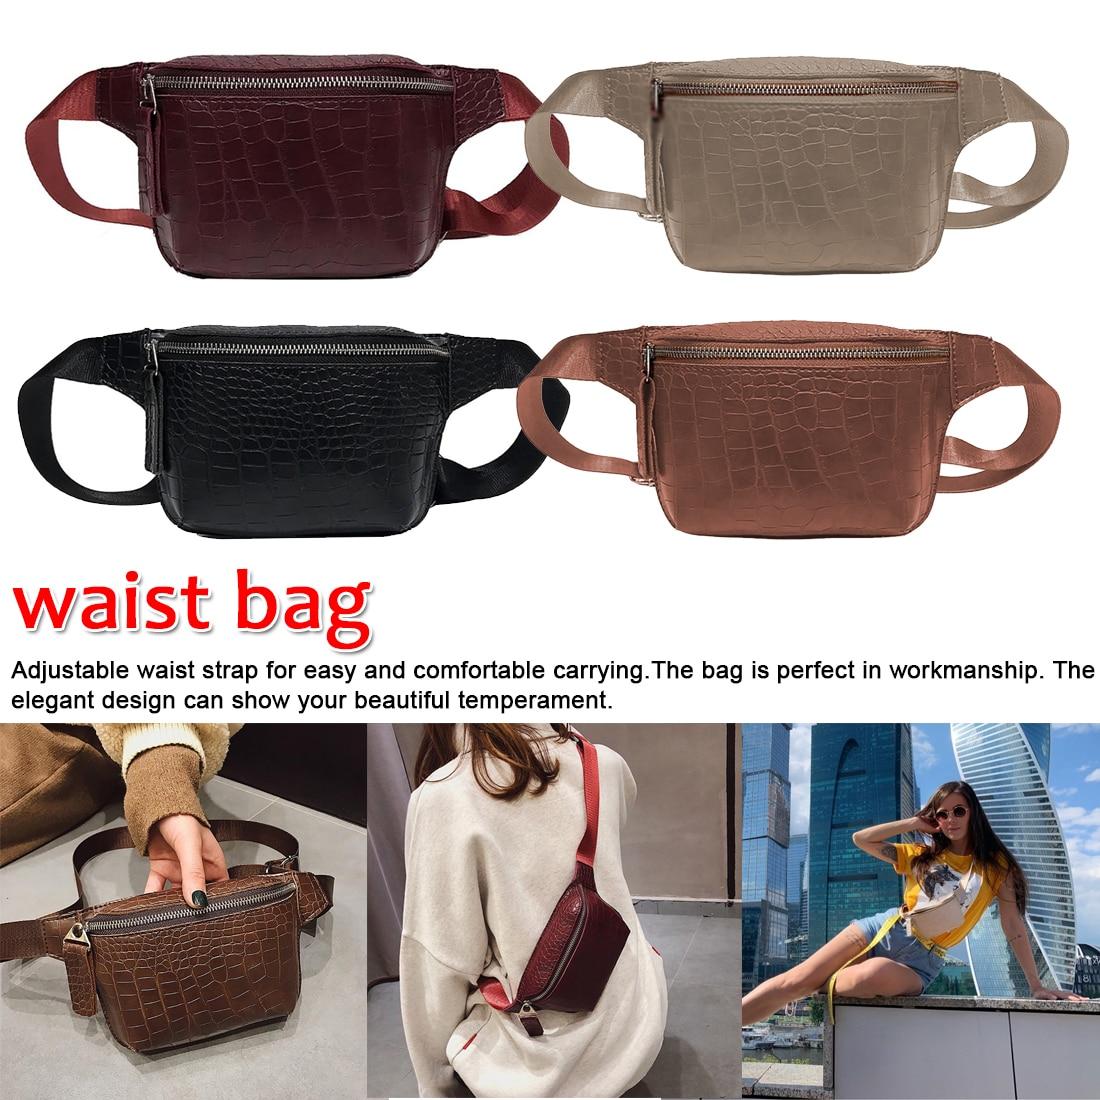 Casual Crossbody Bags For Women Handbag Leather Messenger Shoulder Chest Bag Waist Bag